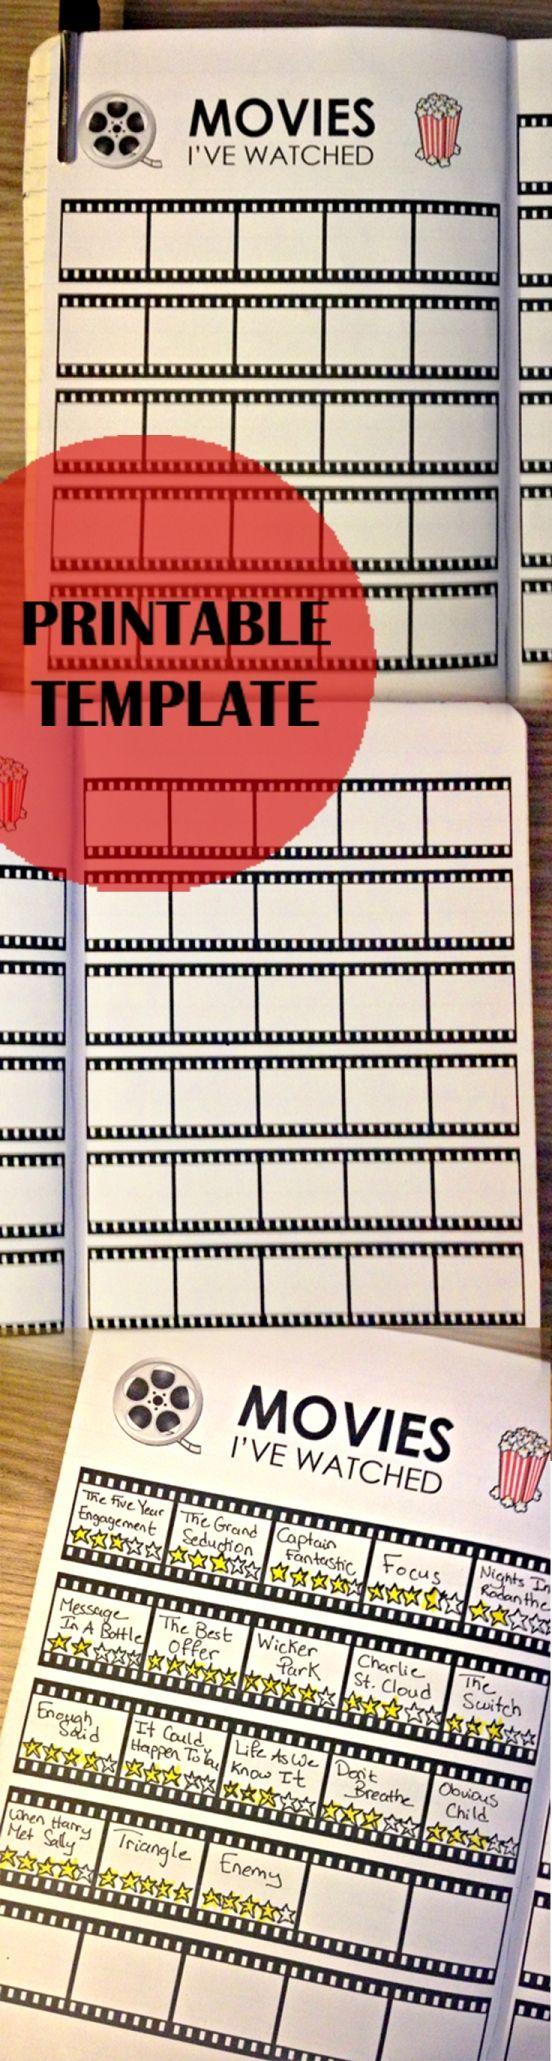 Movies, Journaling, Bullet, Journal, Movies I've Watched, Tracking, Template, Printable, Bu-Jo, Movie, Tracker, Print, Printing, Dana Sobh